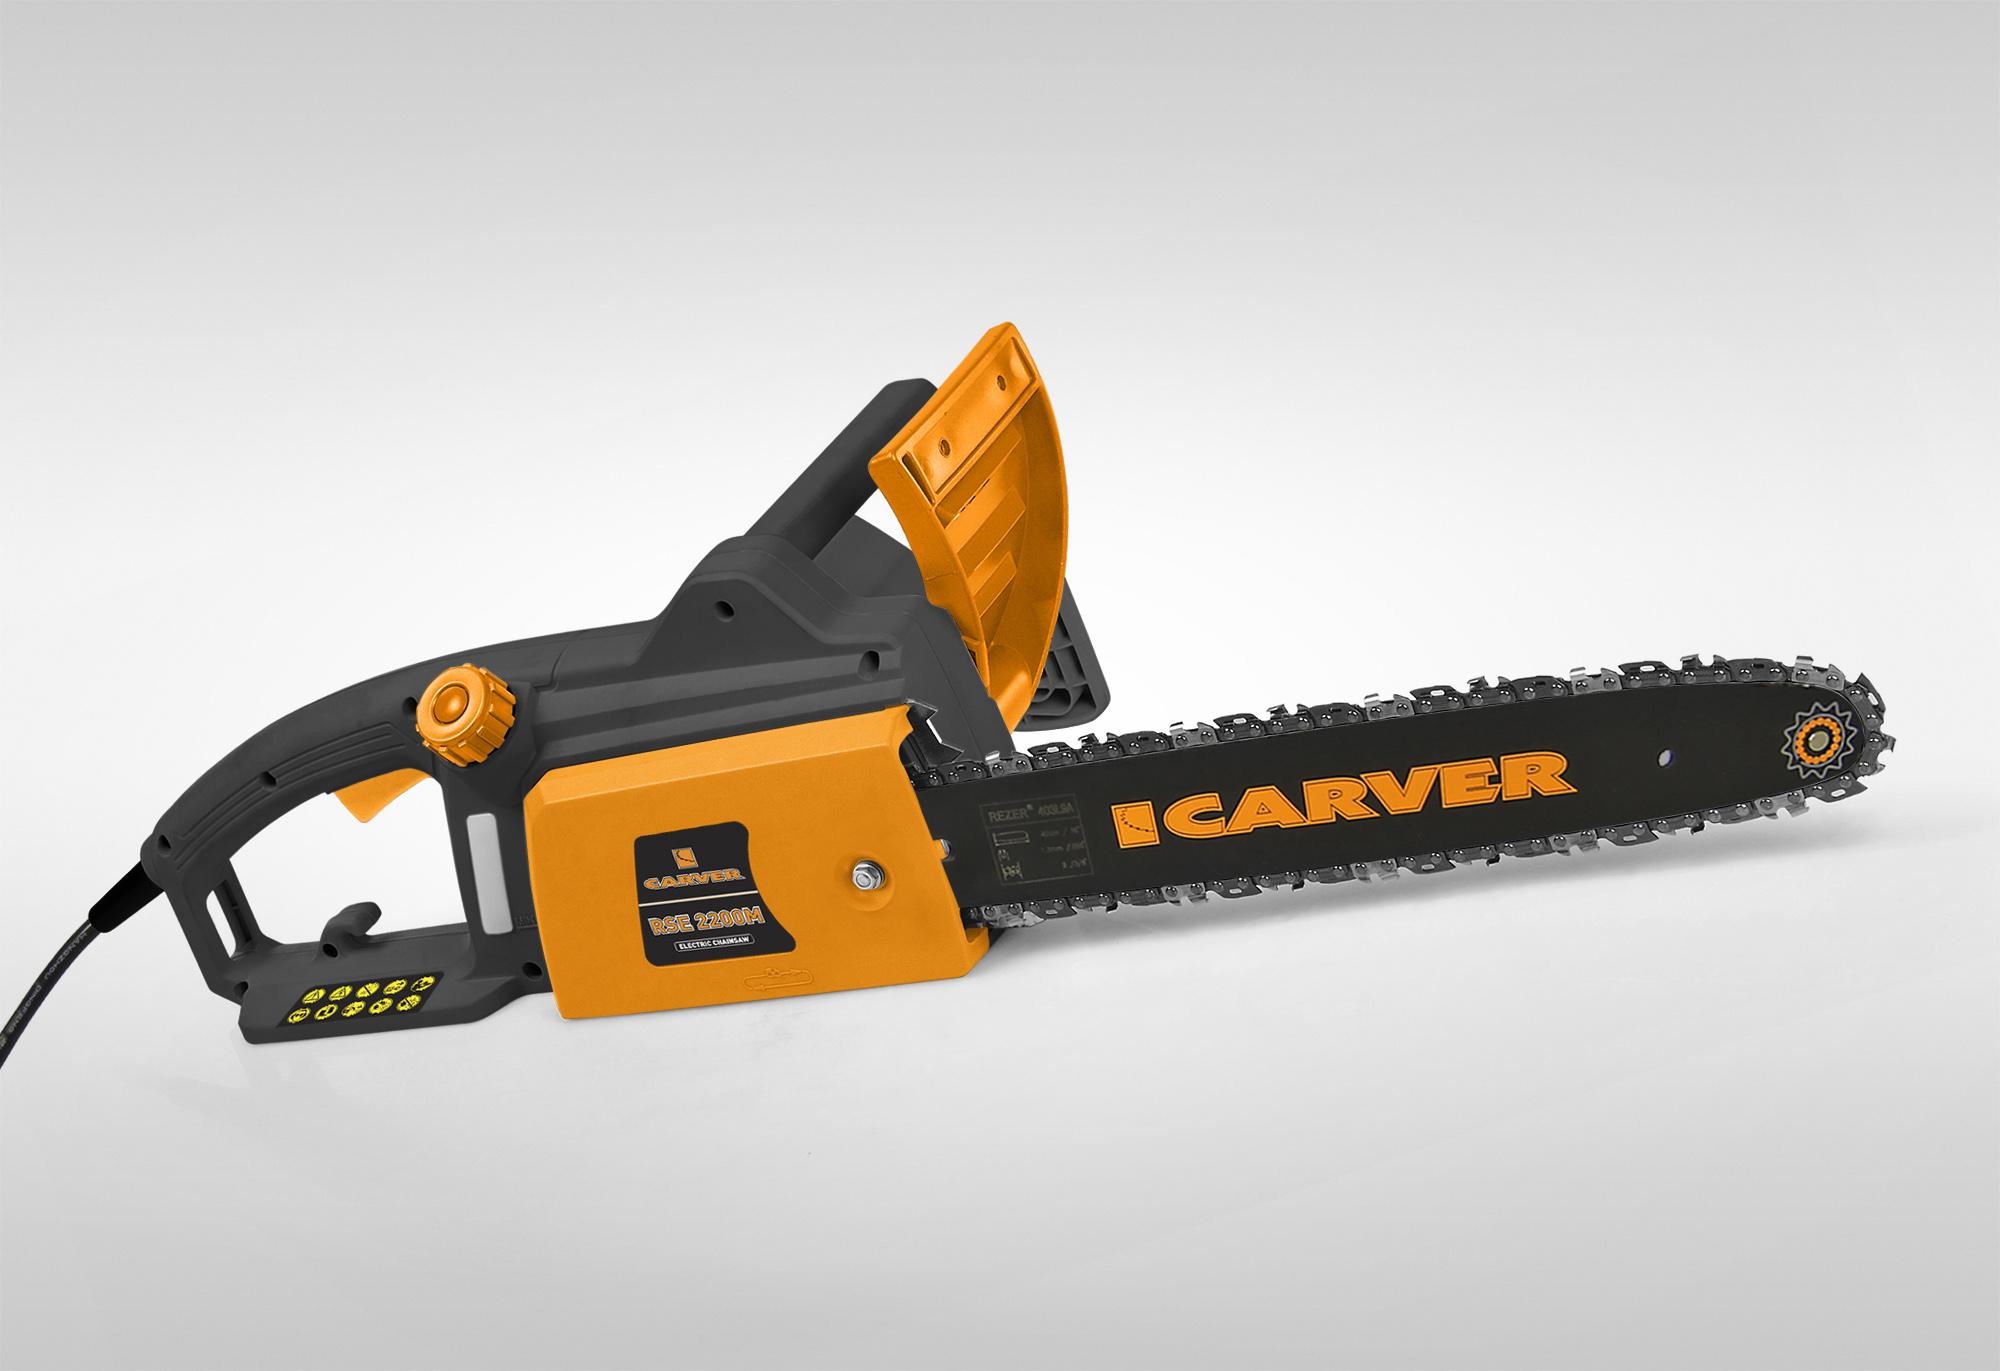 Carver-2200